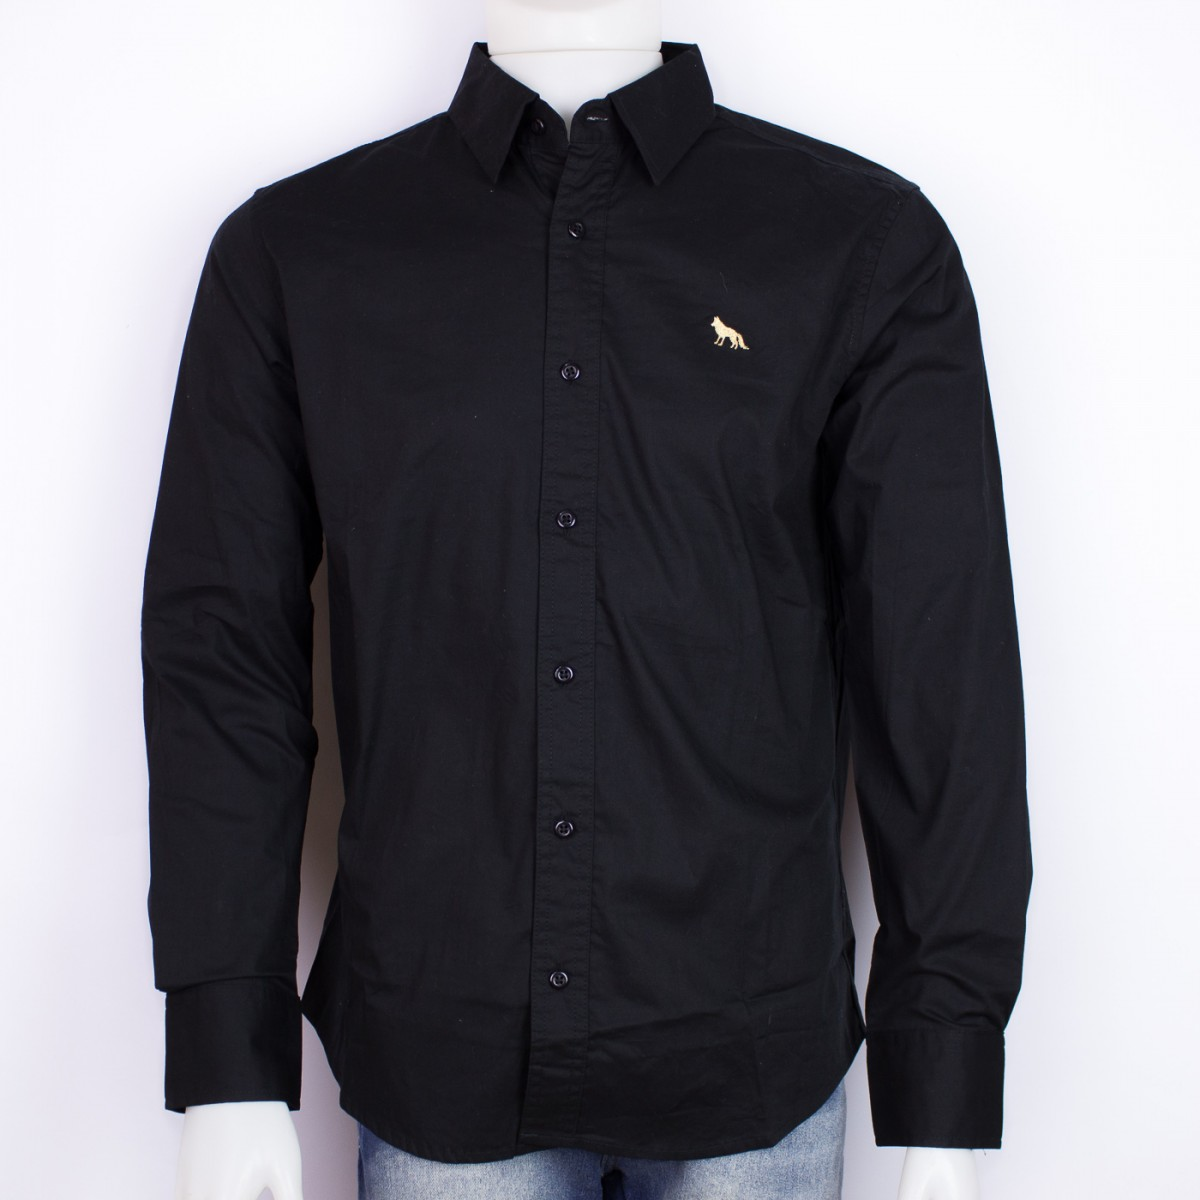 1922f6eca50de Bizz Store - Camisa Social Masculina Acostamento Preta Algodão